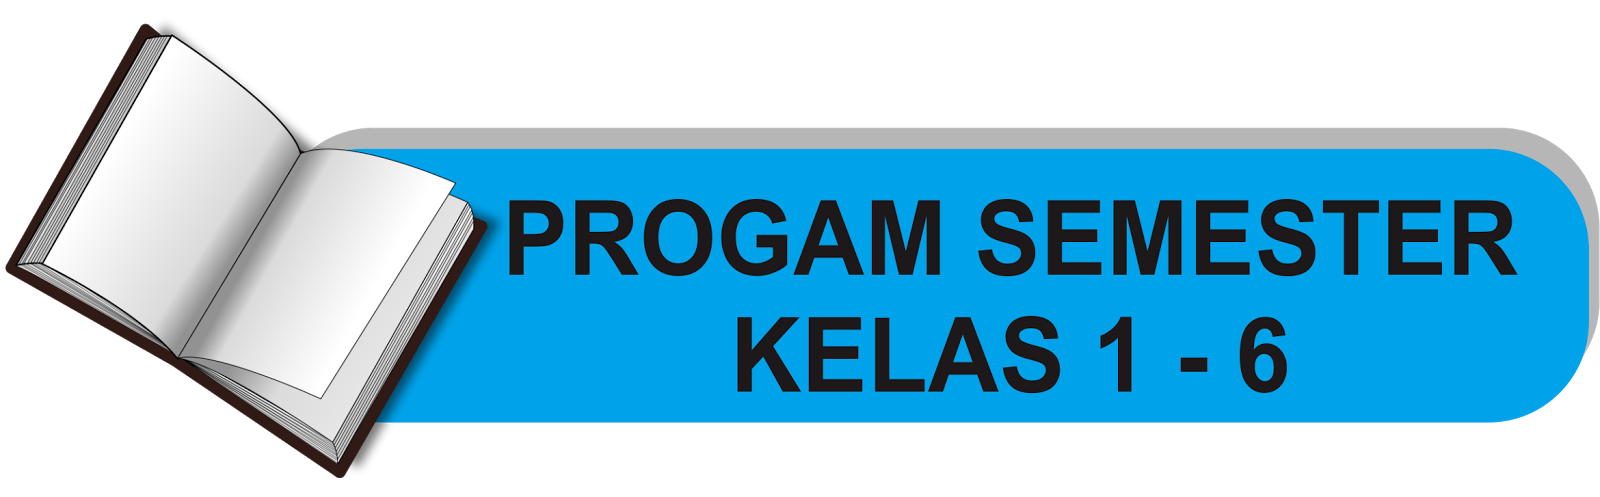 Silabus Sd Kelas 5 Sd Rpp Kurikulum 2013 Dan Silabus Kelas 6 Sd Agus Chandra Kelas 1 Program Pembelajaran Dan Matrik Hubungan Kompetensi Kelas